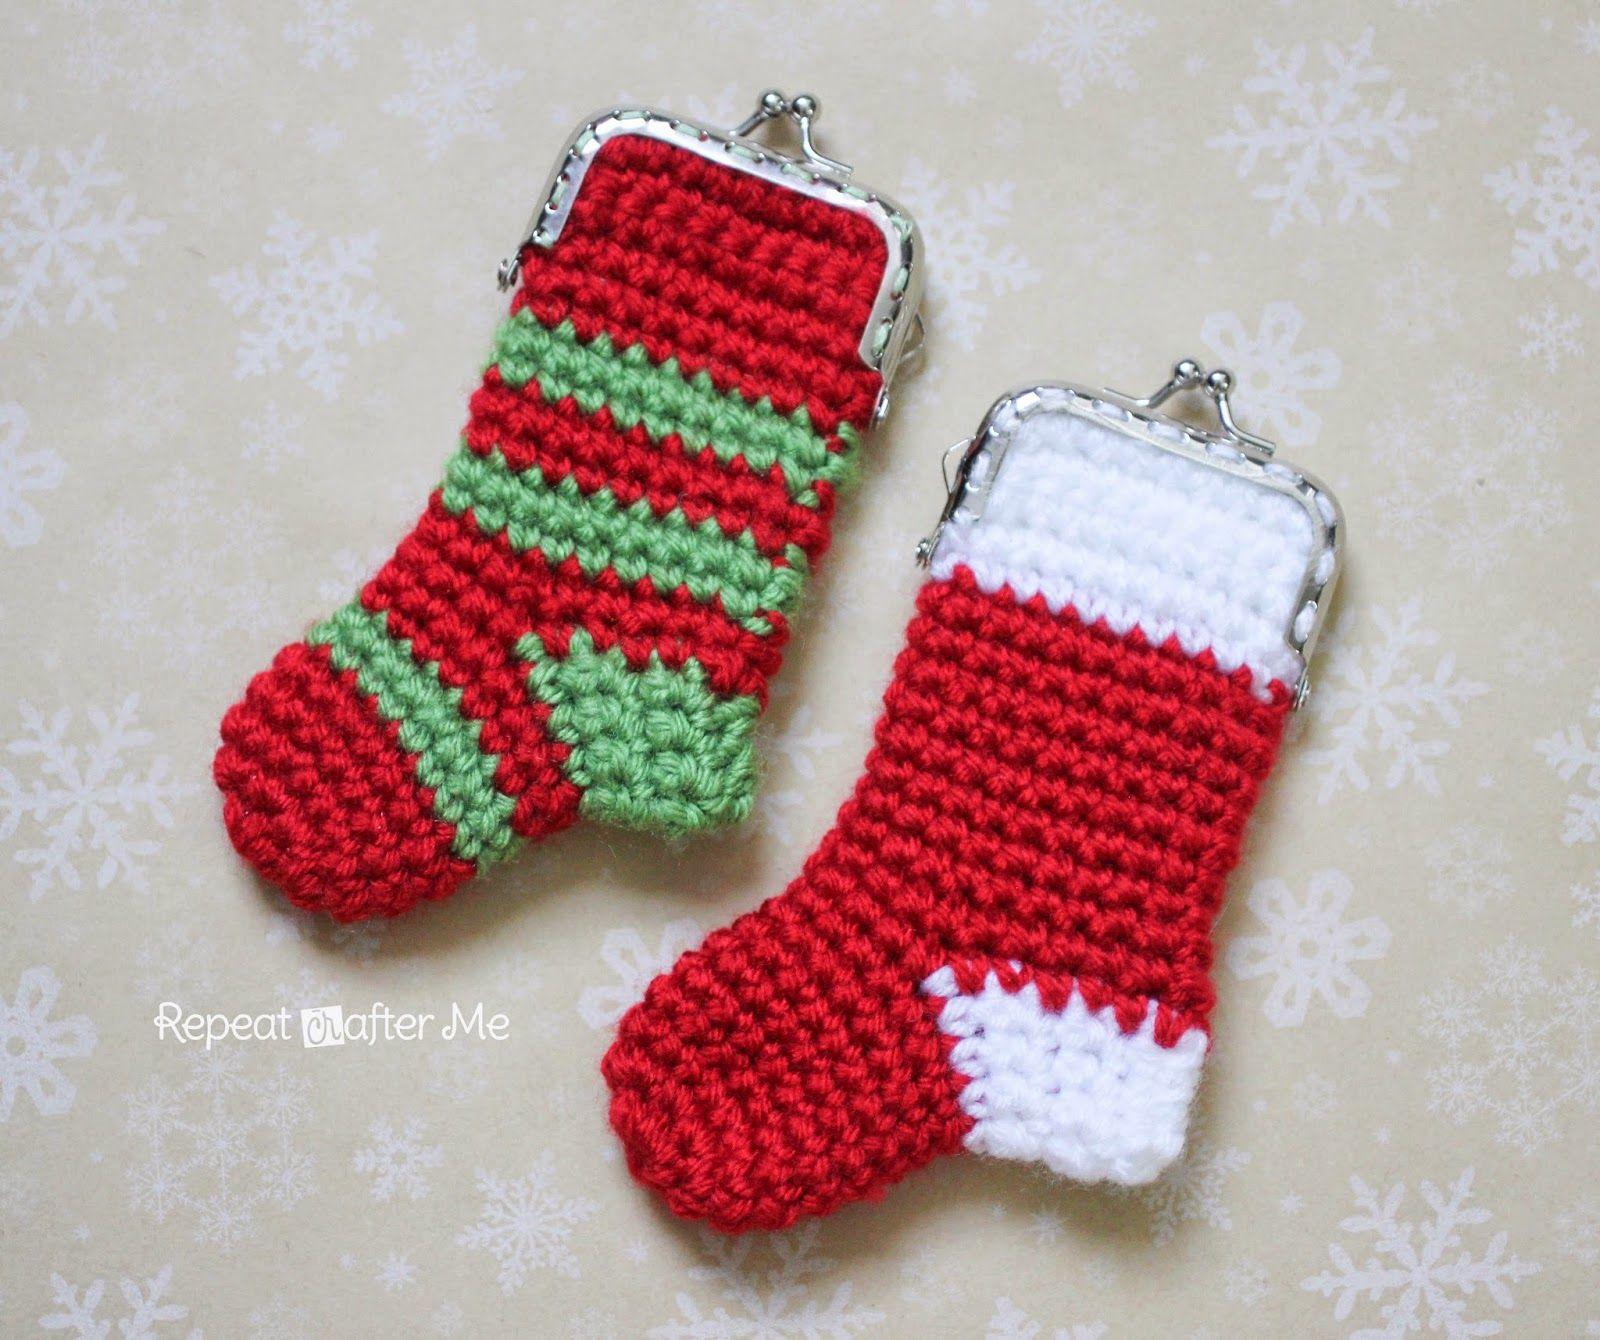 medias al crochet para bebés | crochet | Pinterest | Para bebés ...